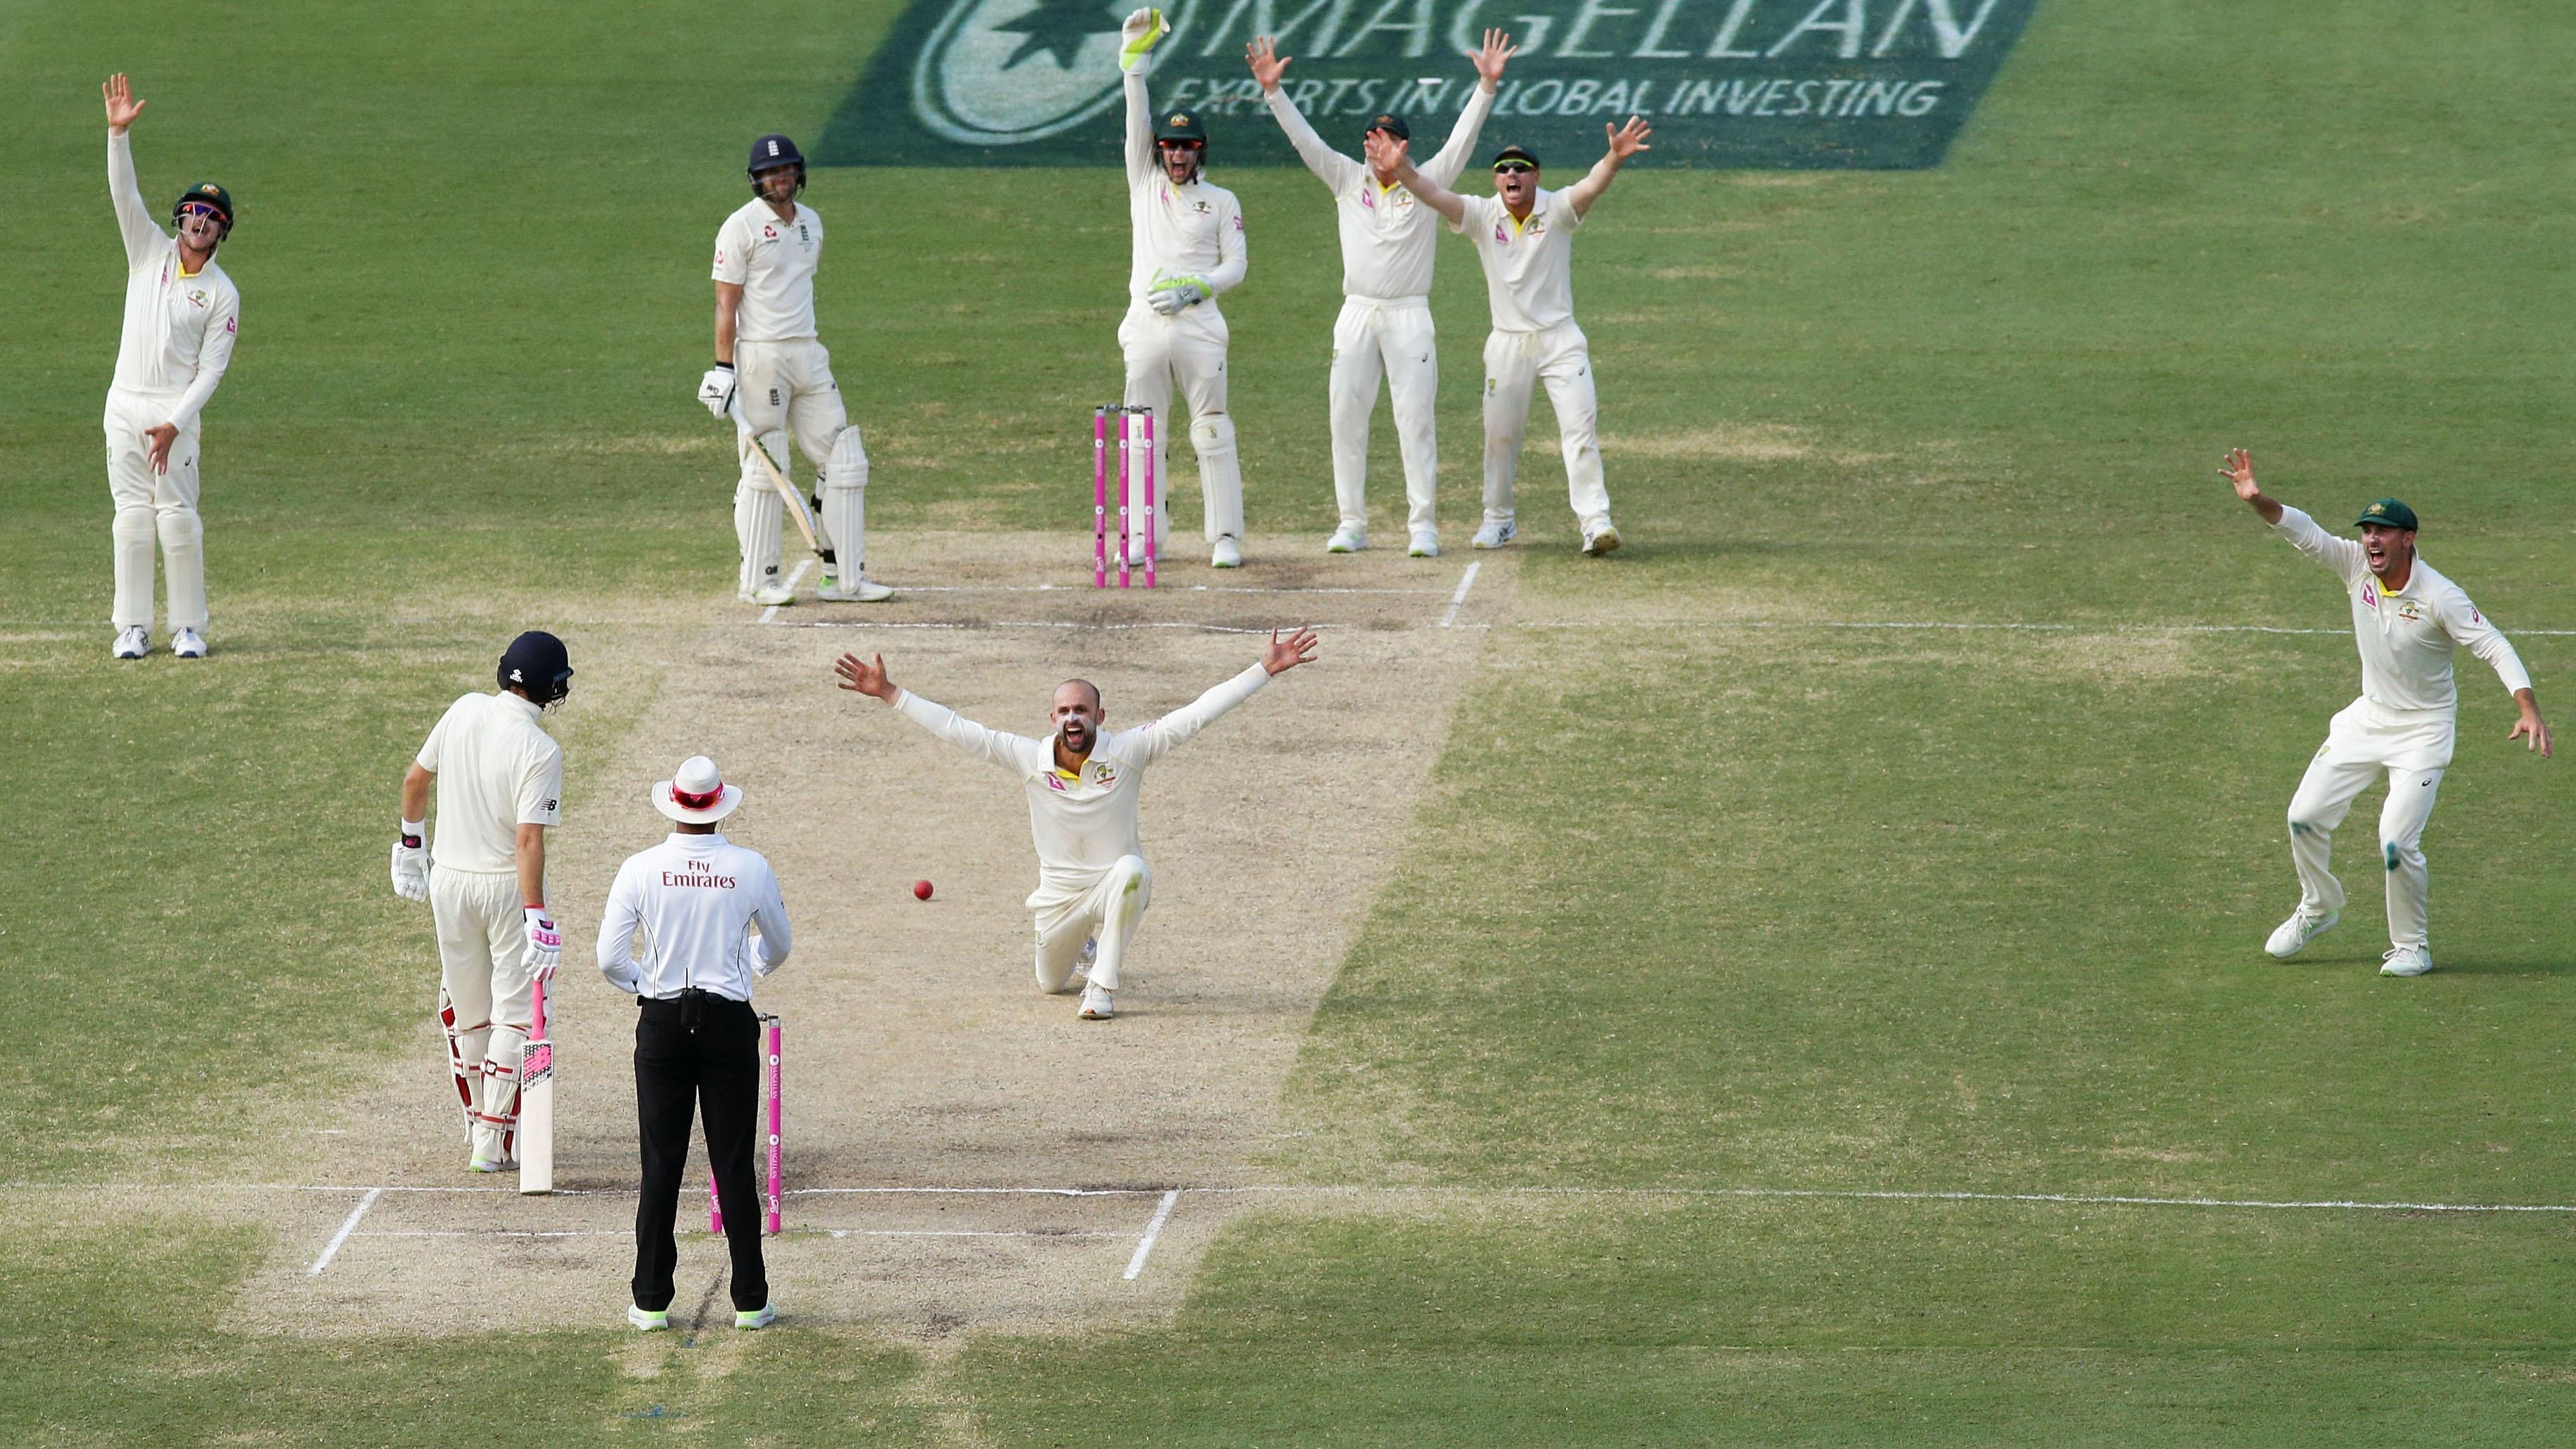 seven network lands cricket media rights in partnership with foxtel rh triplem com au cricket machine cricket live score